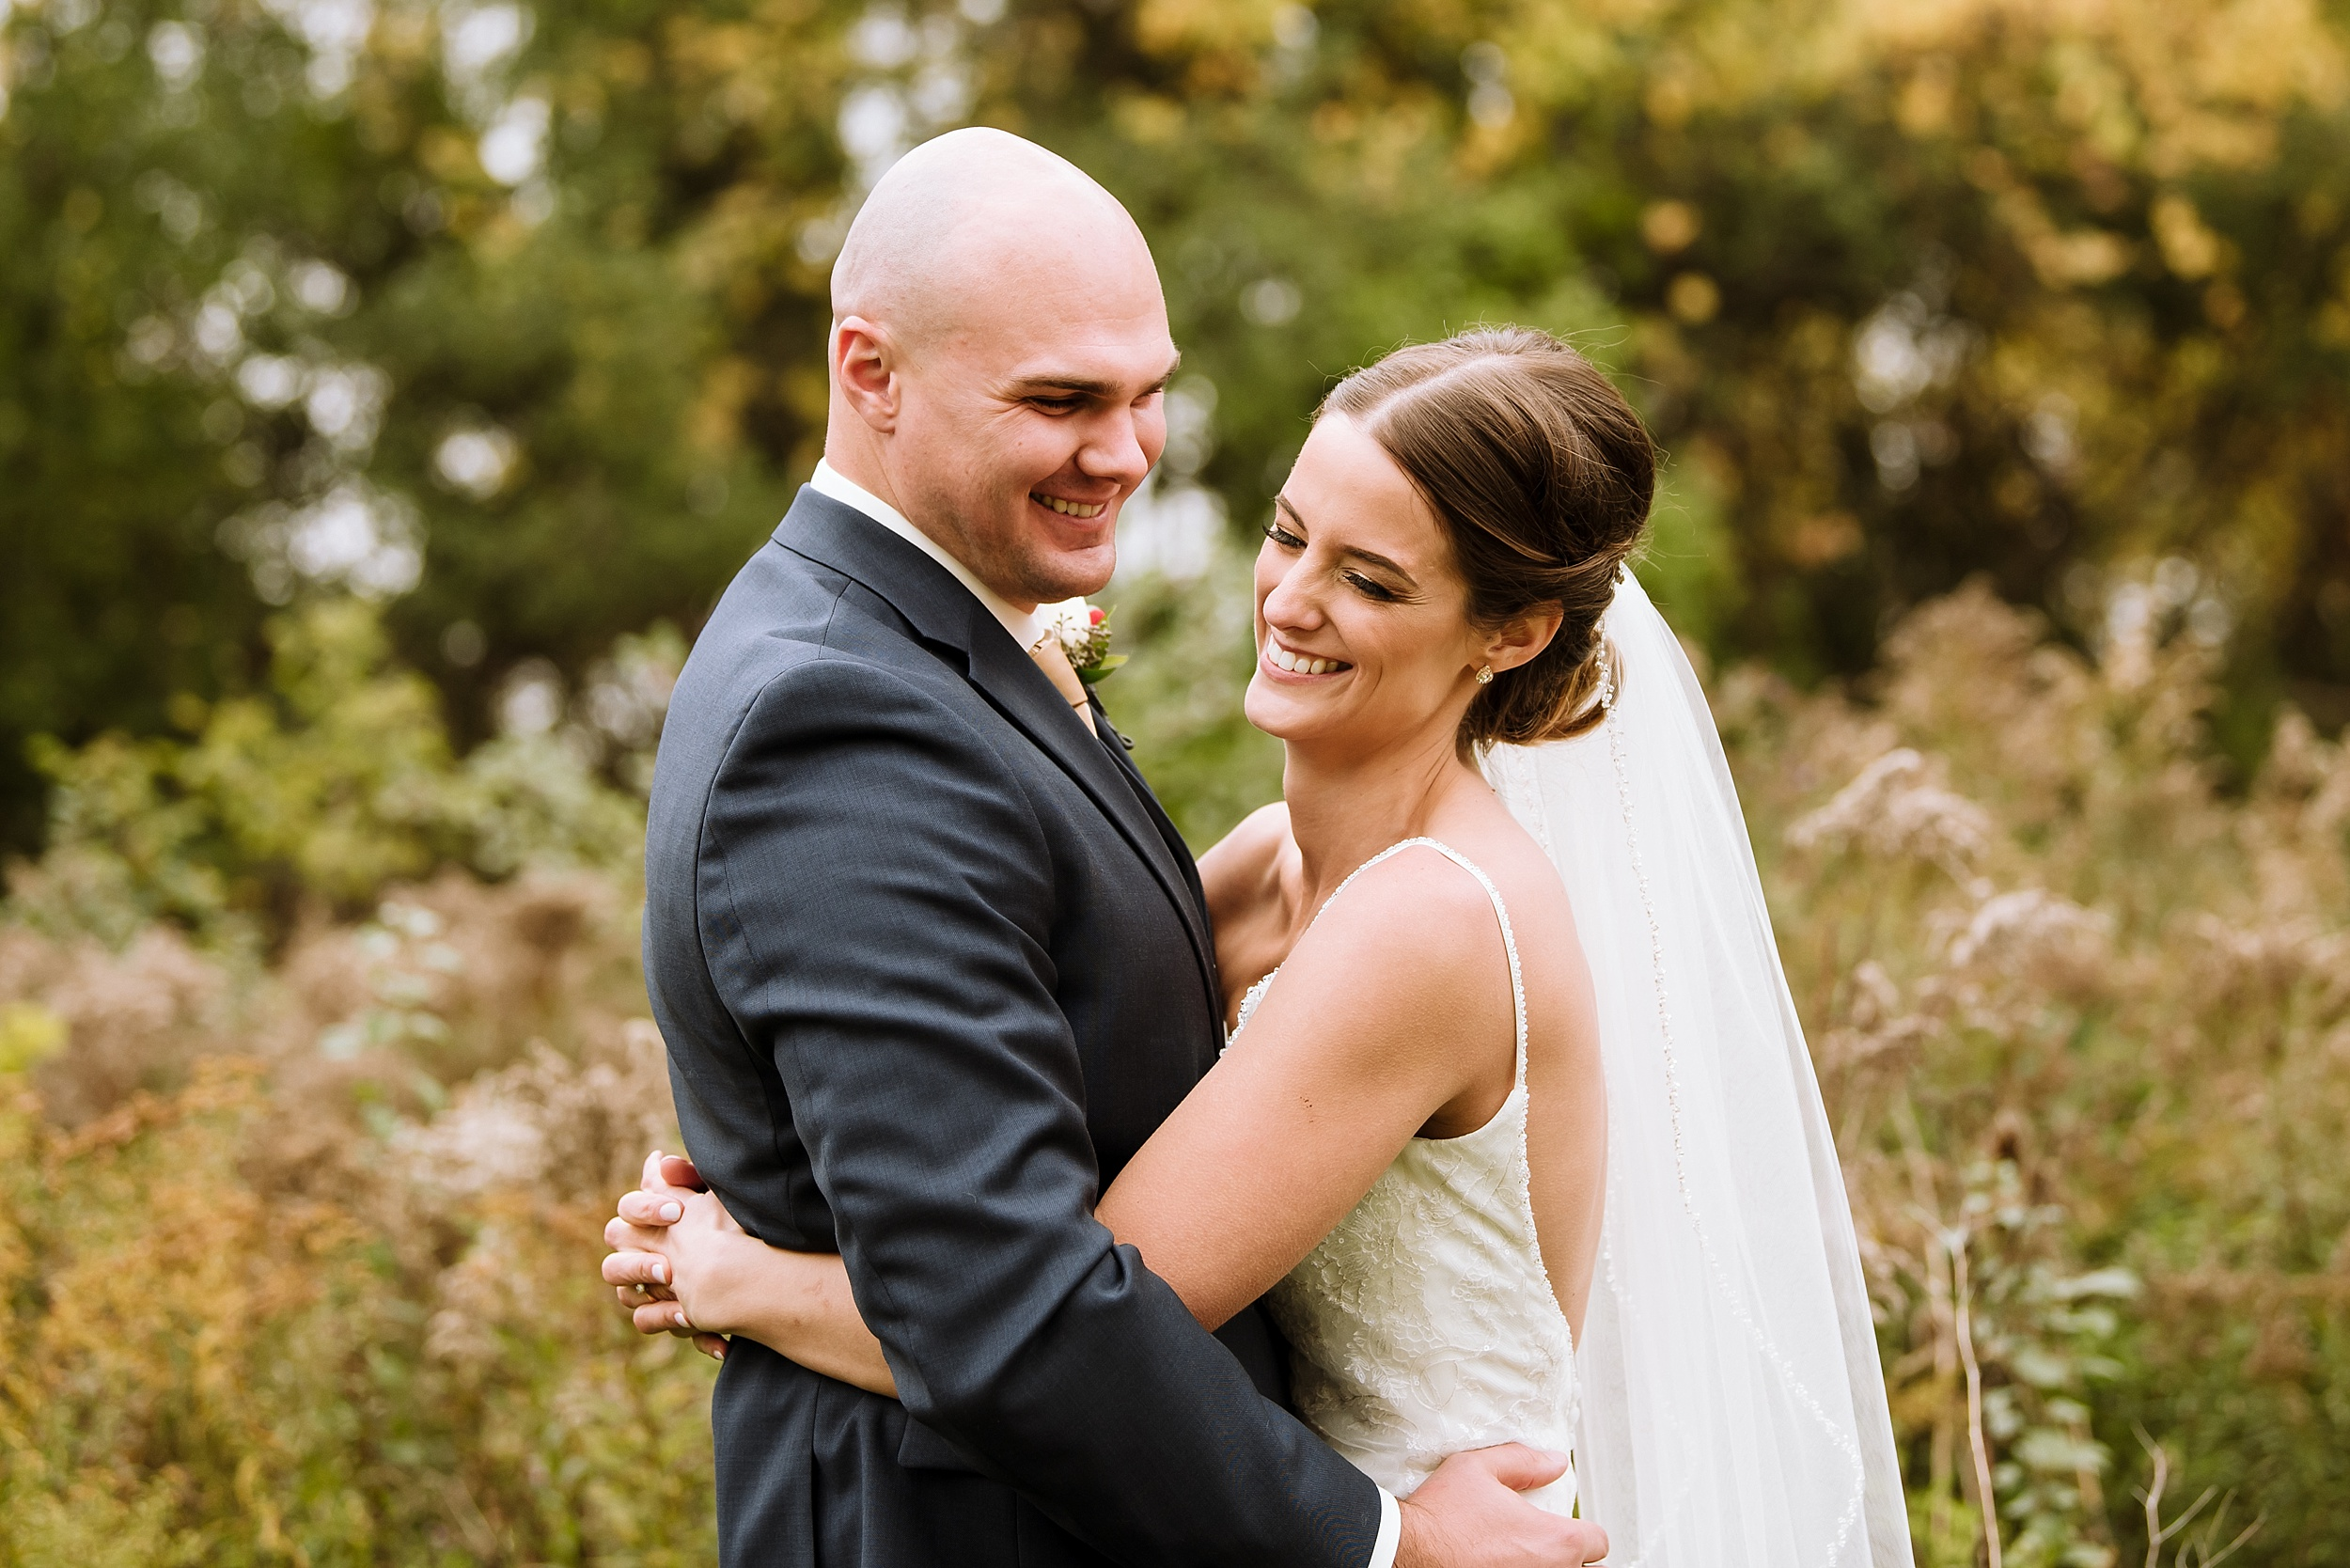 Windemere_Manor_Fall_Wedding_London_Toronto_Wedding_Photographer_0023.jpg